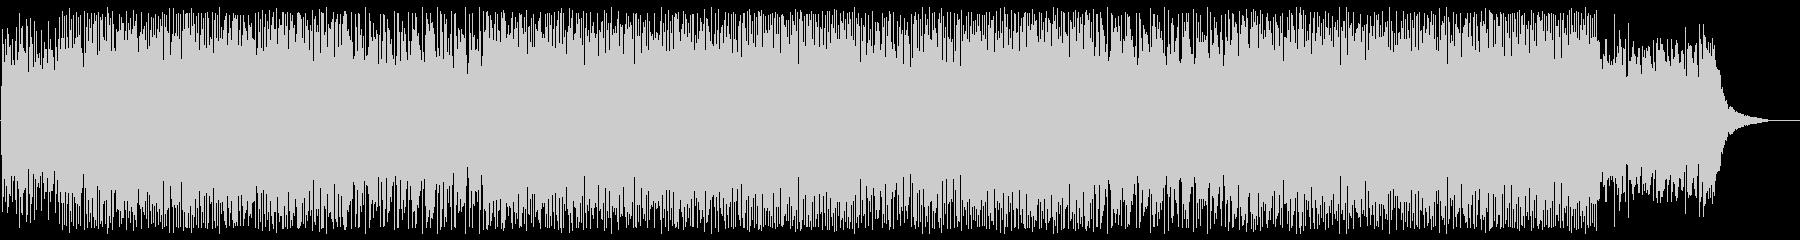 bpmが早くピアノ混じりのシンセサイザーの未再生の波形